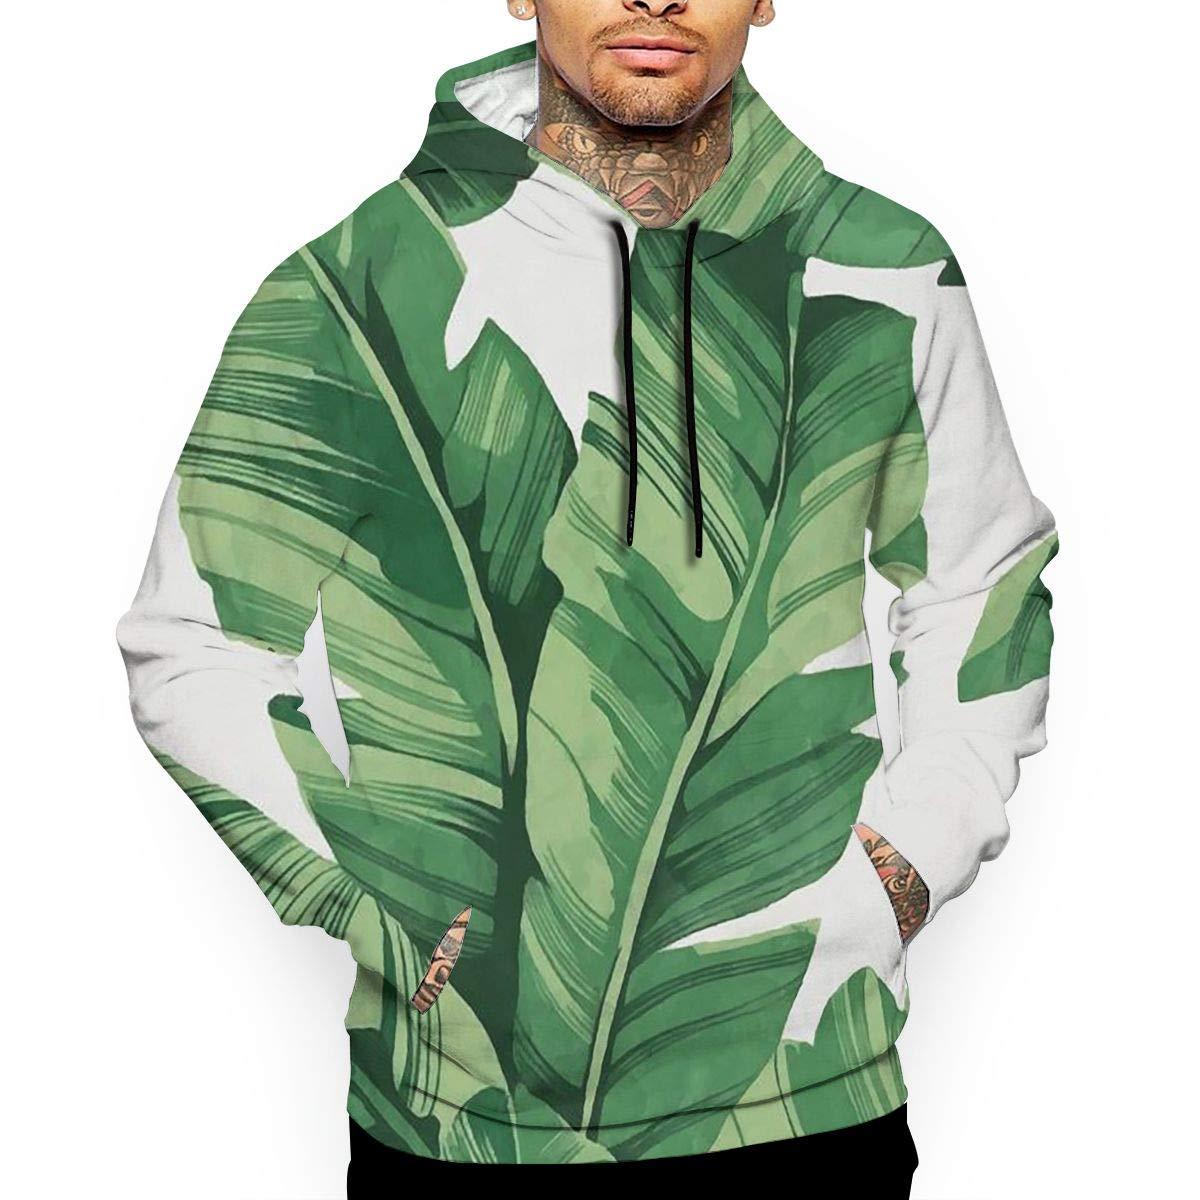 YUANSHAN Tropical Plant Banana Tree Leaves Mans Long Sleeve Hoodie Casual Pocket Hooded Sweatshirt